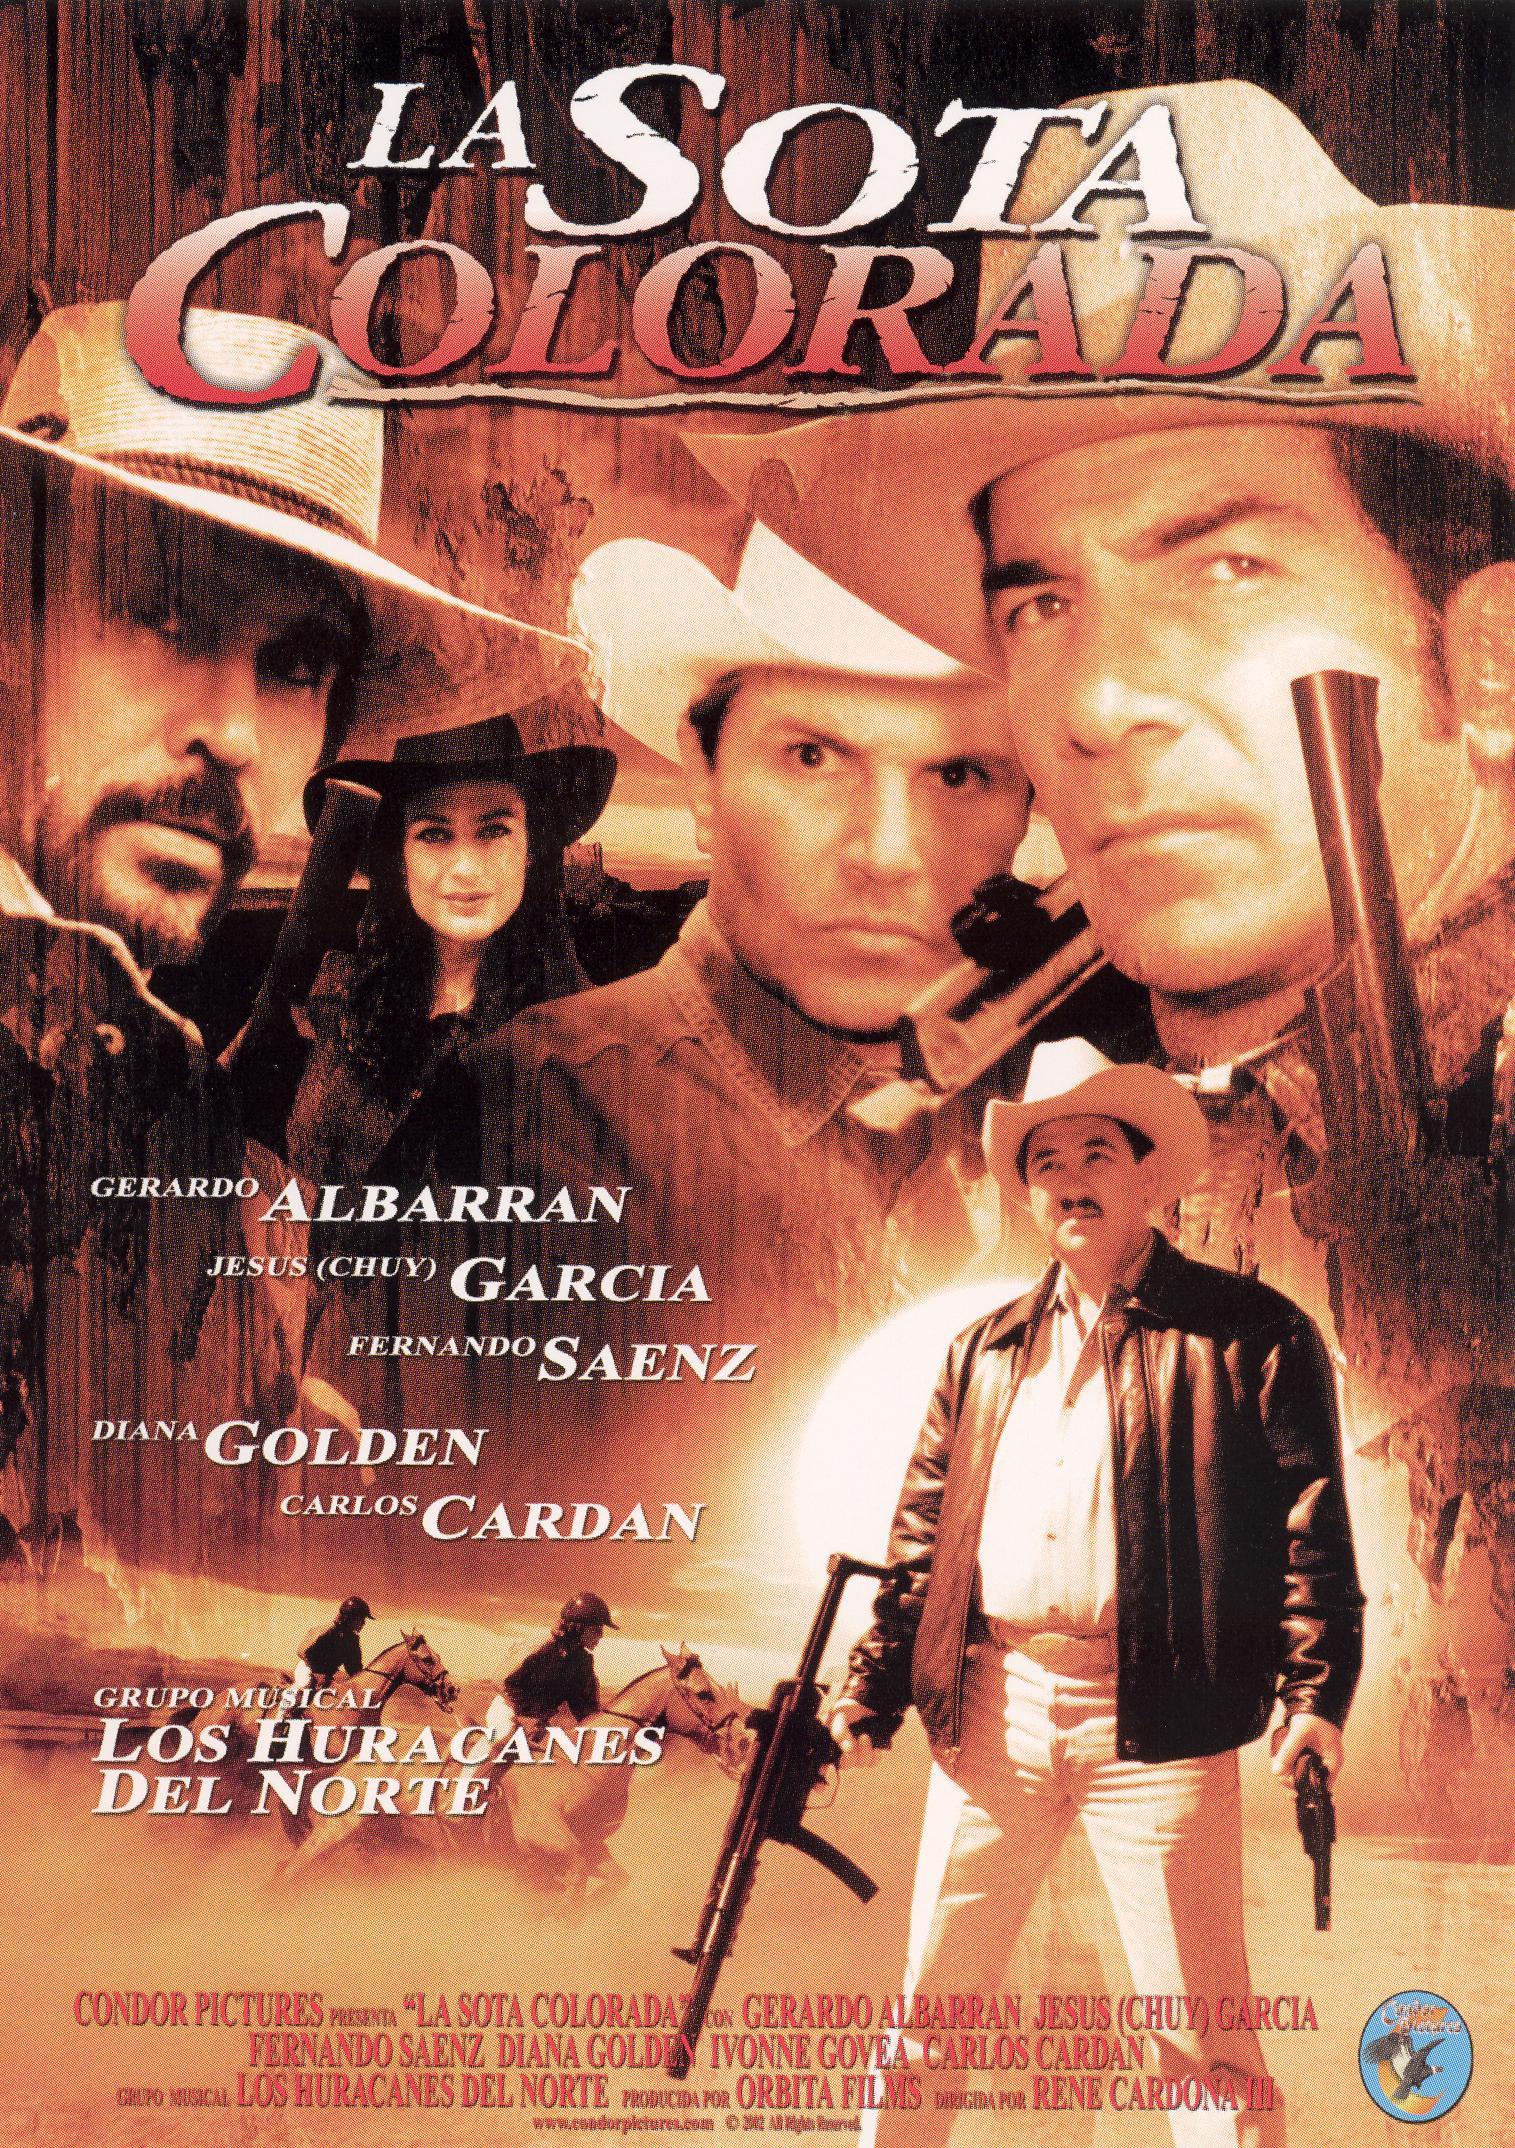 La Sota Colorada